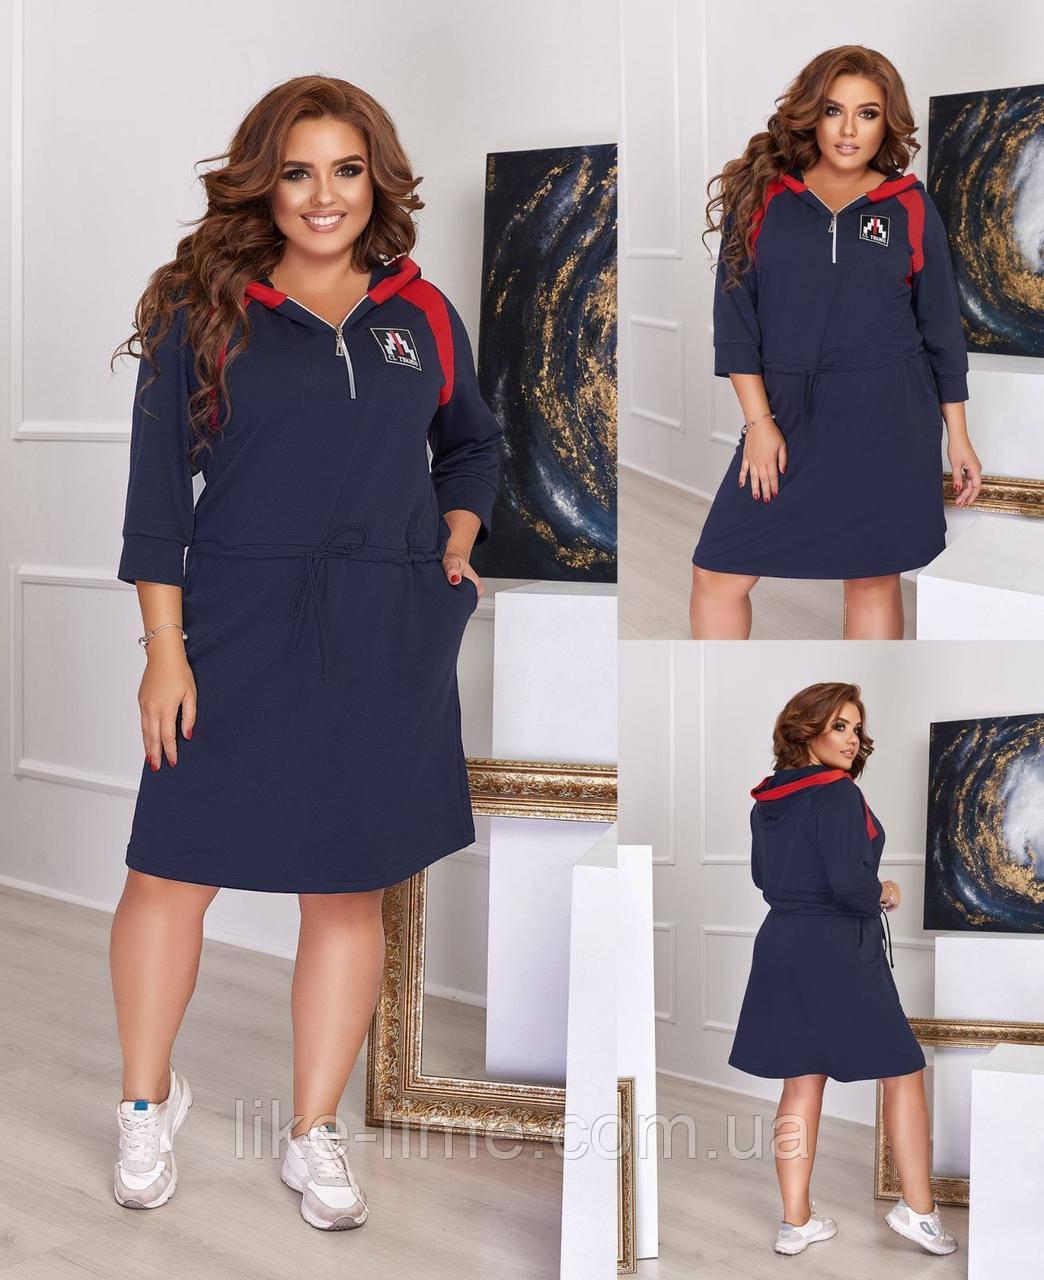 Украина ТД / Женское платье, красивое платье, платье женское батал Синий, 56-58